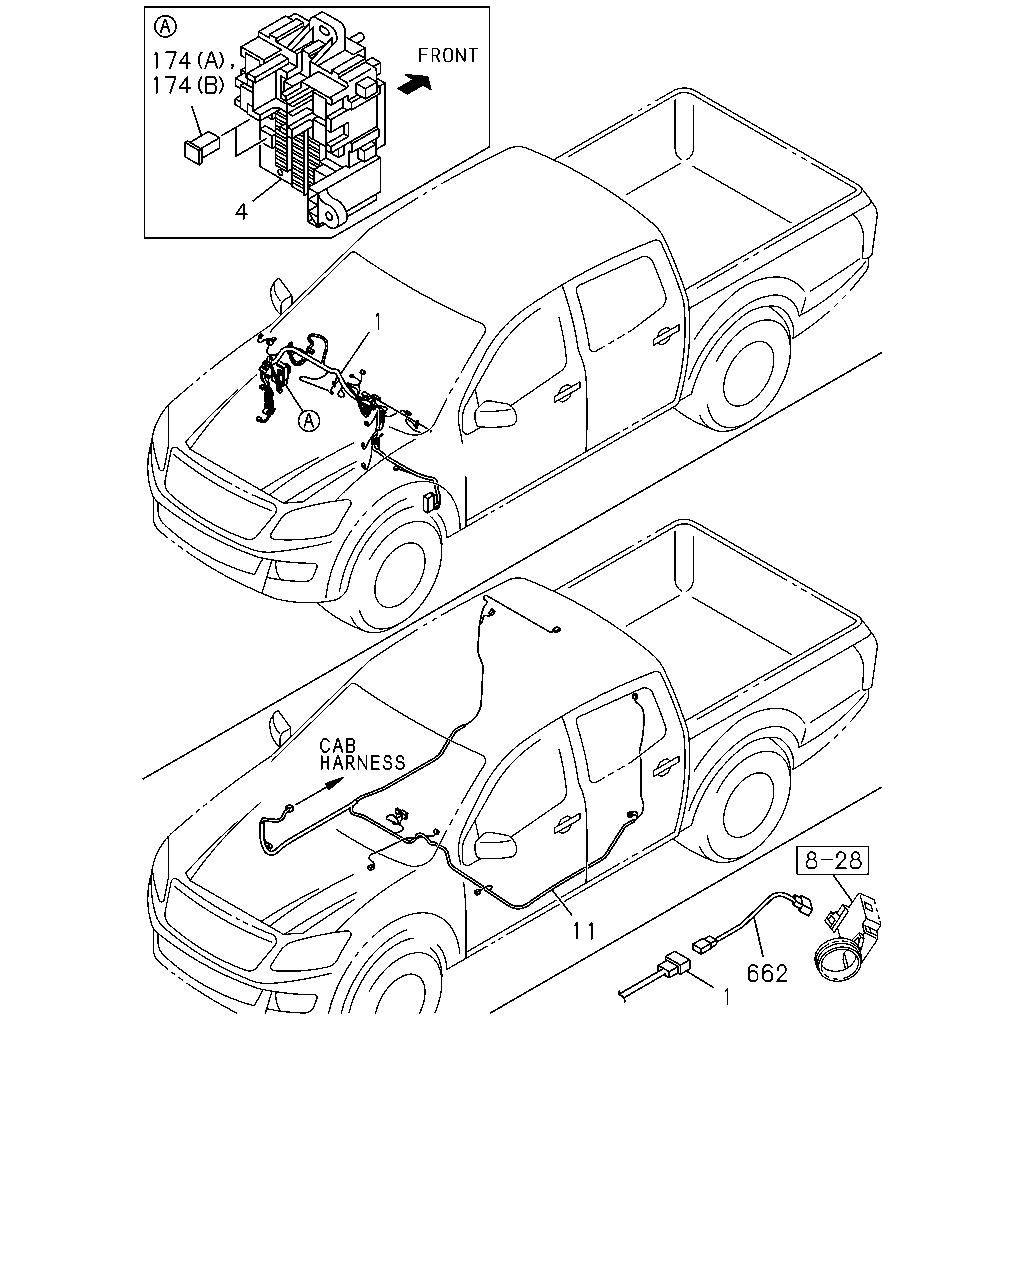 A tfb5cf 4x2 extended cab long